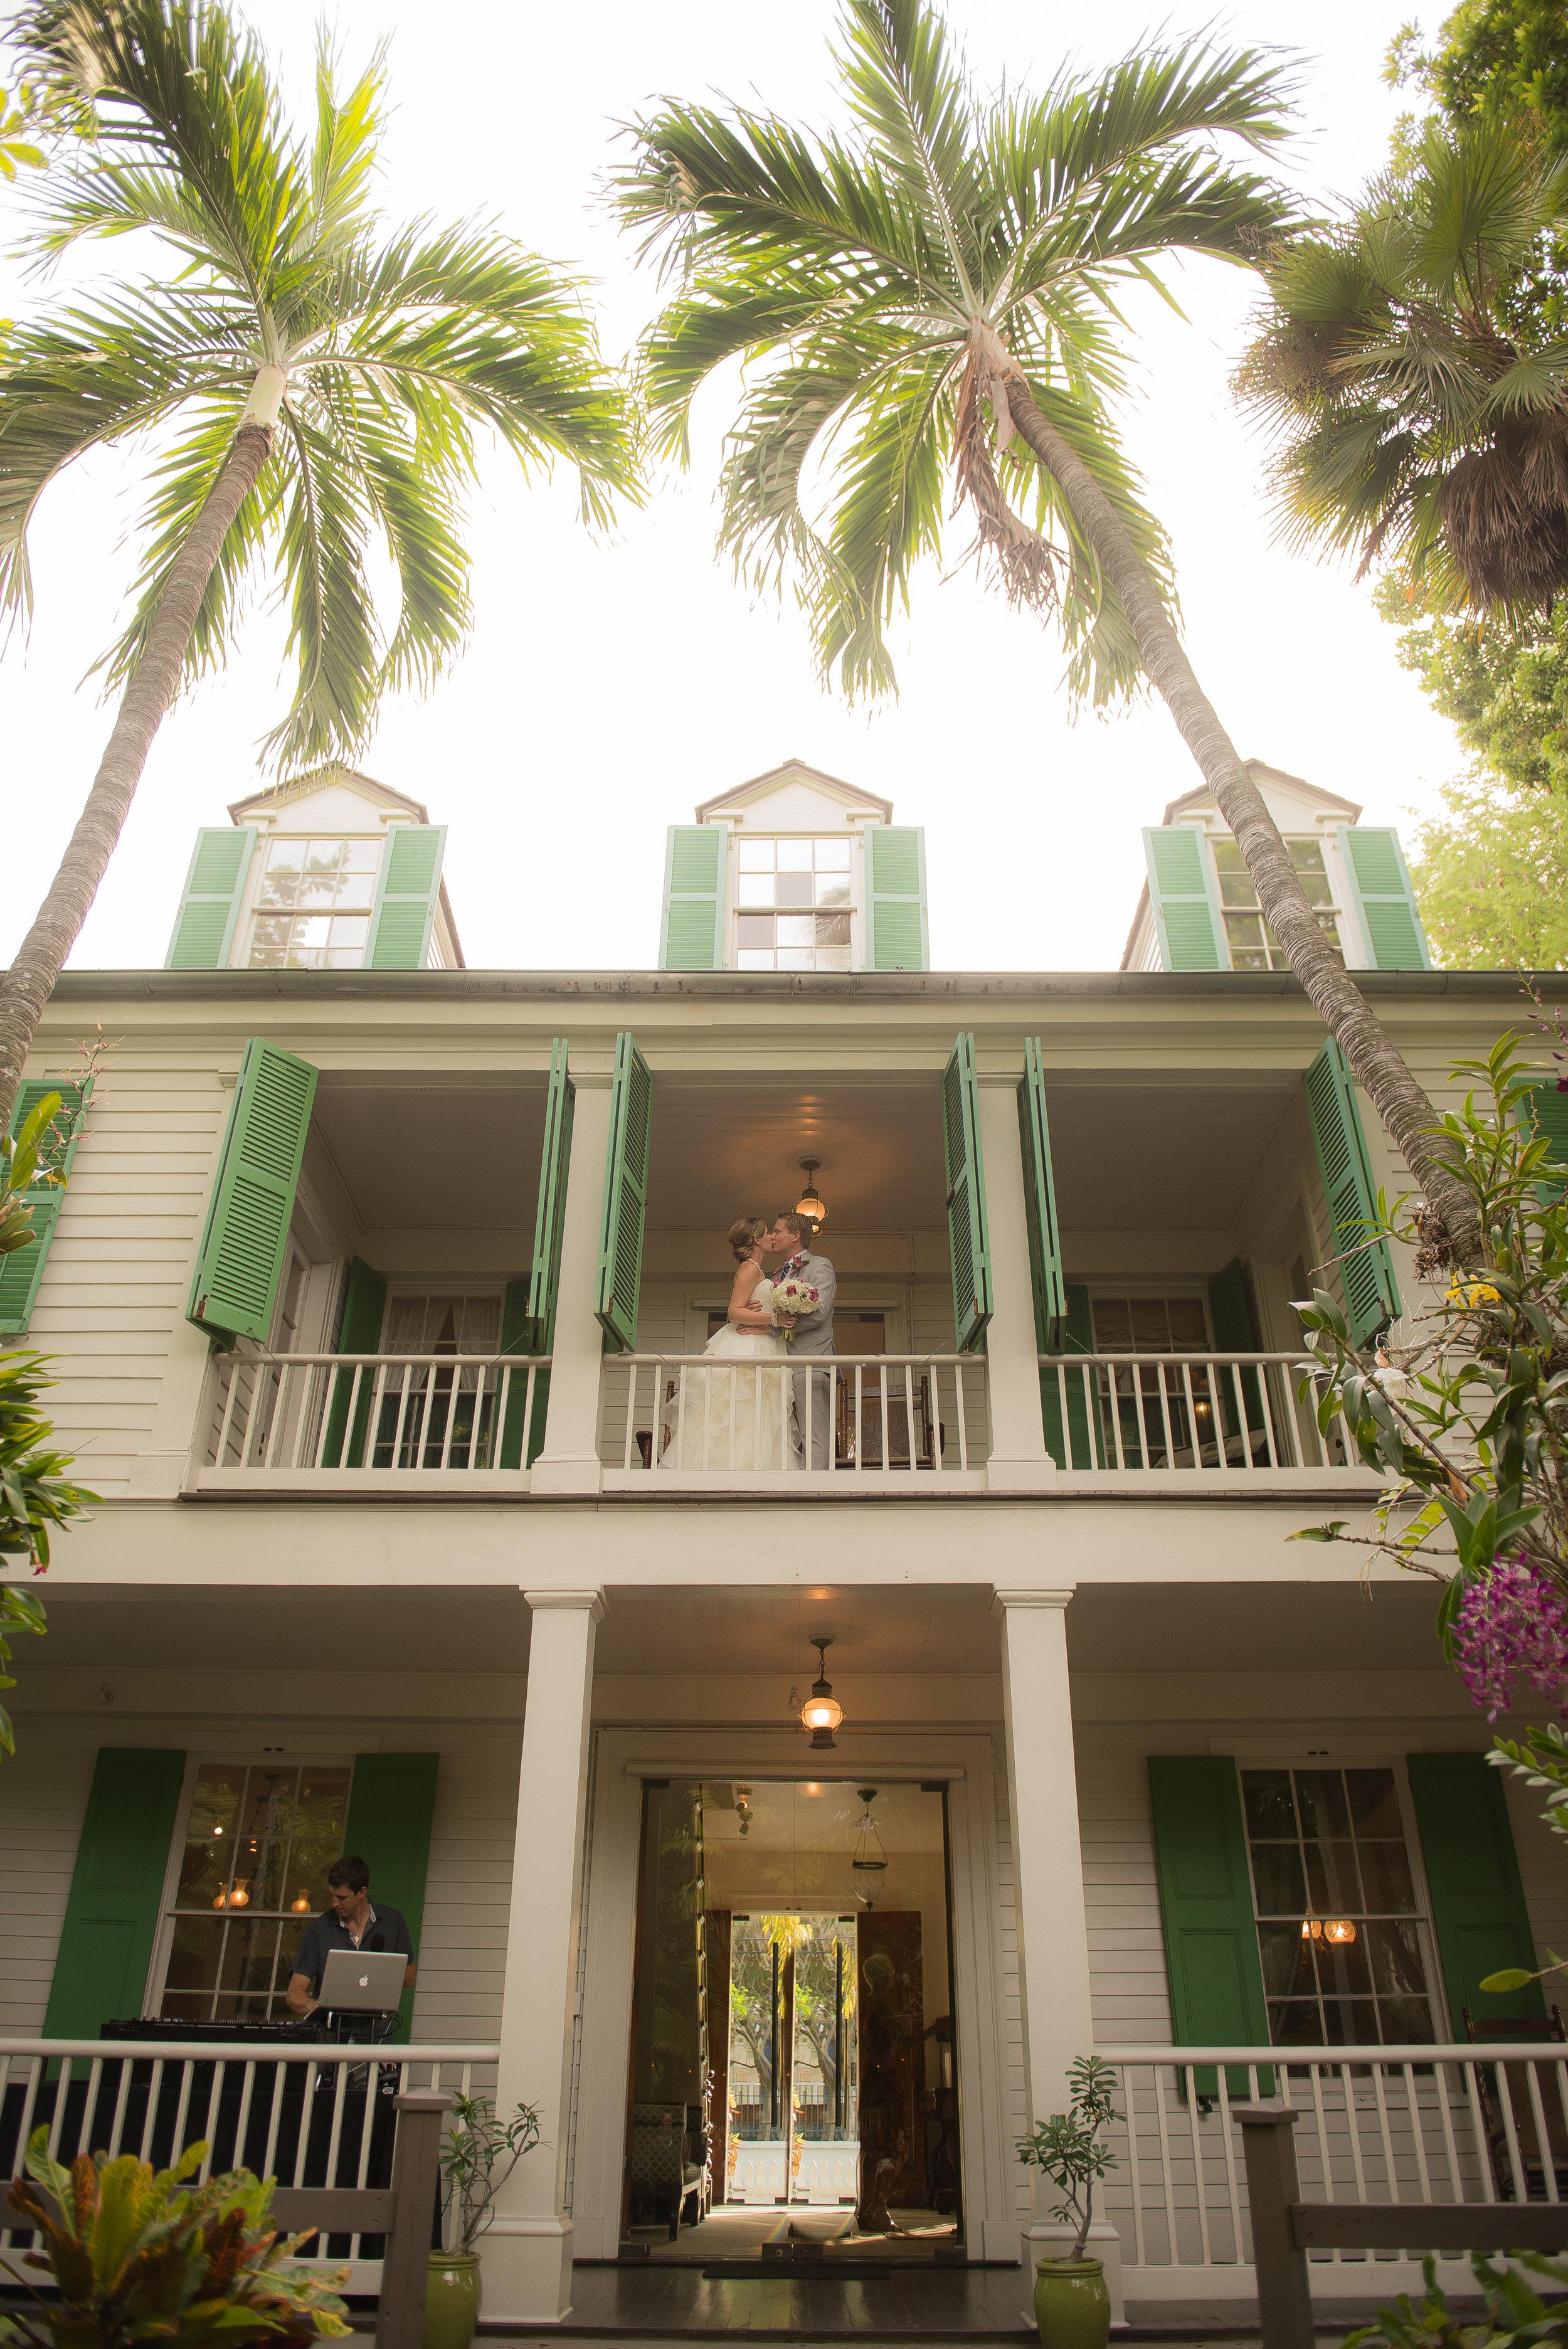 Amanda+James_Audubon House Key West Wedding35.jpg